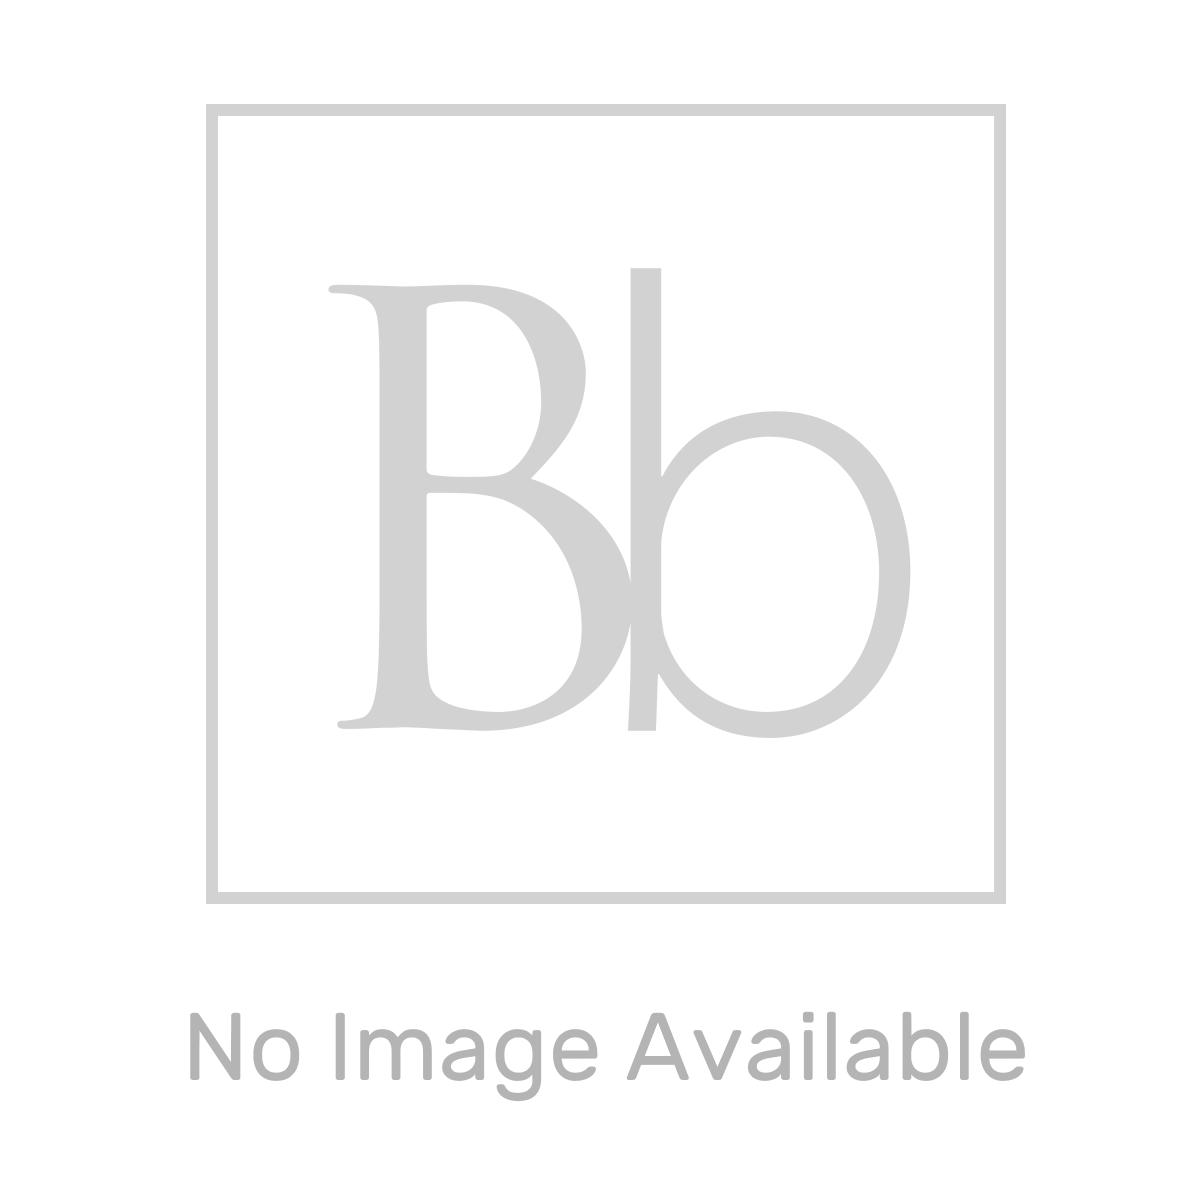 RAK Origin 62 Full Access Close Coupled Toilet with Soft Close Seat